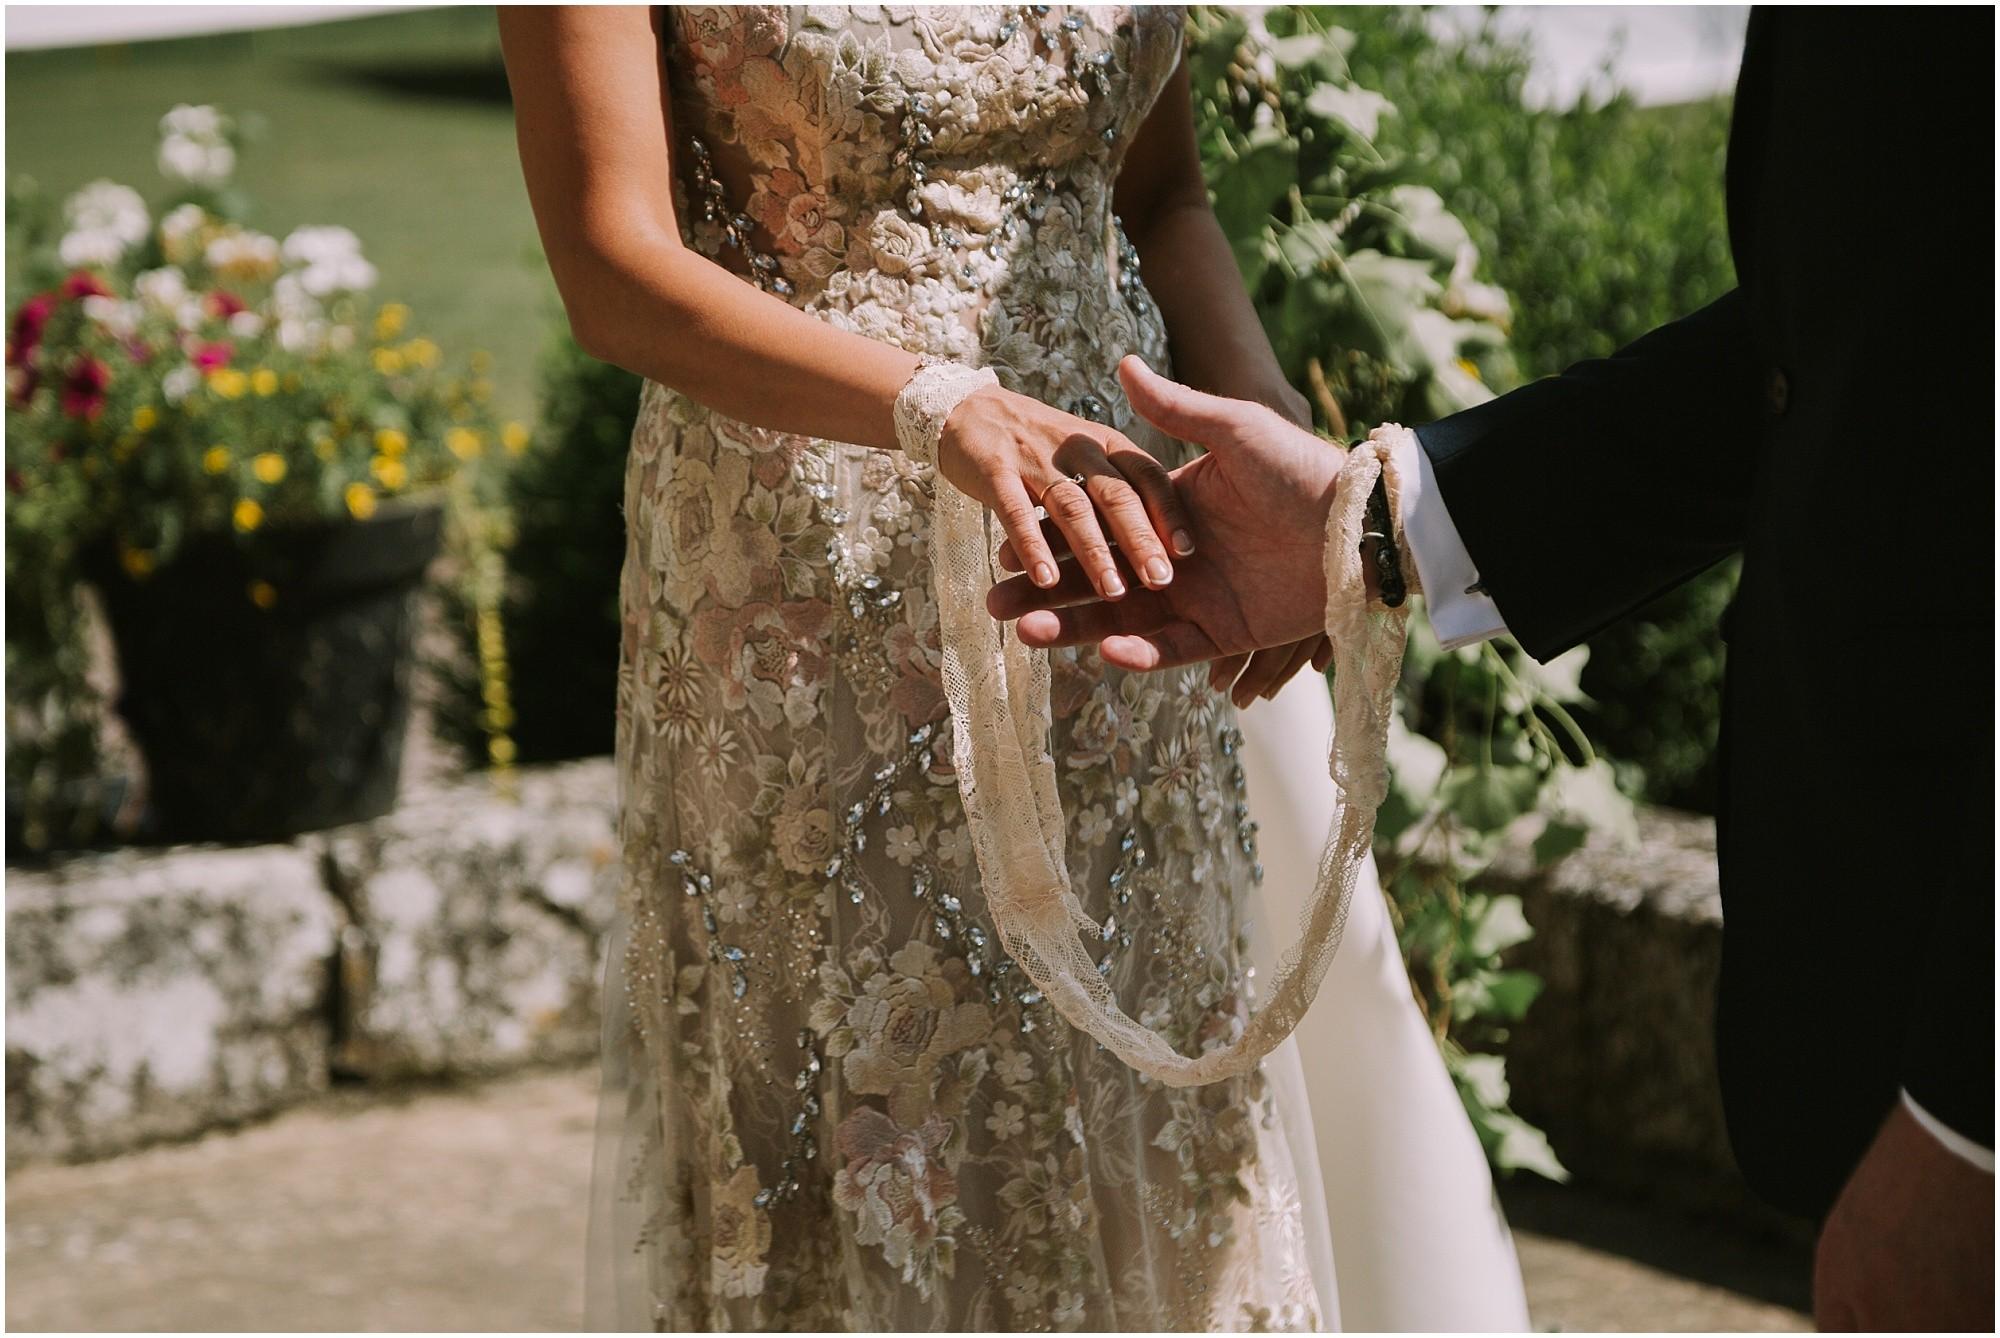 Kateryna-photos-photographer-mariage-chateau-saint-paterne-alencon-normandie-mayenne-le-mans_0080.jpg